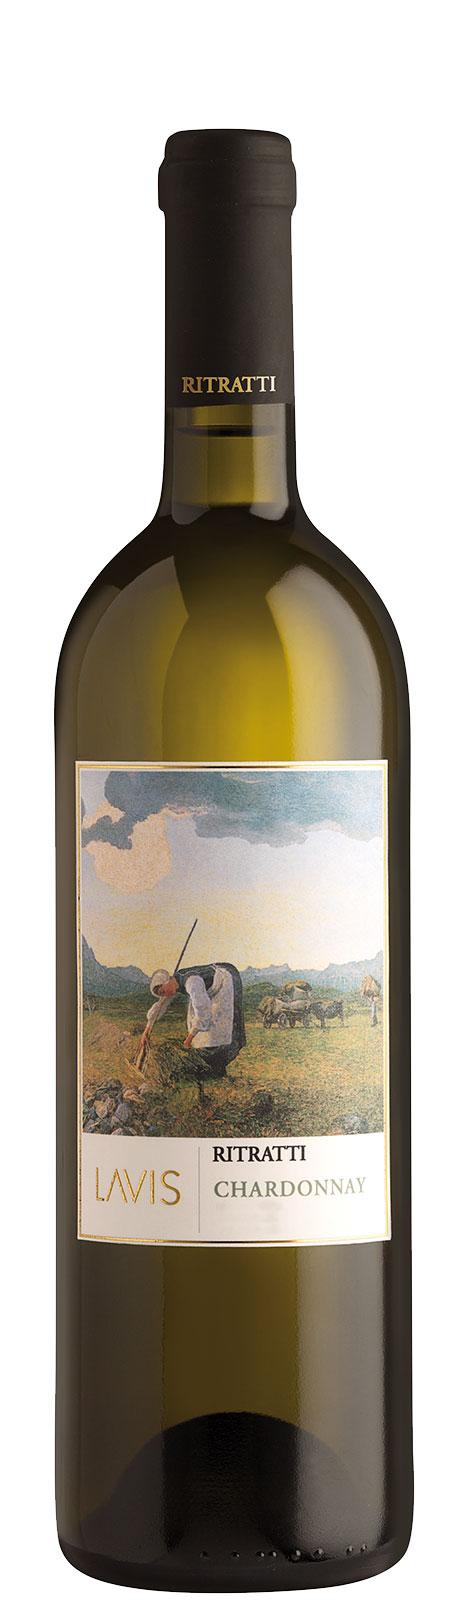 lavis-chardonnay-ritratti